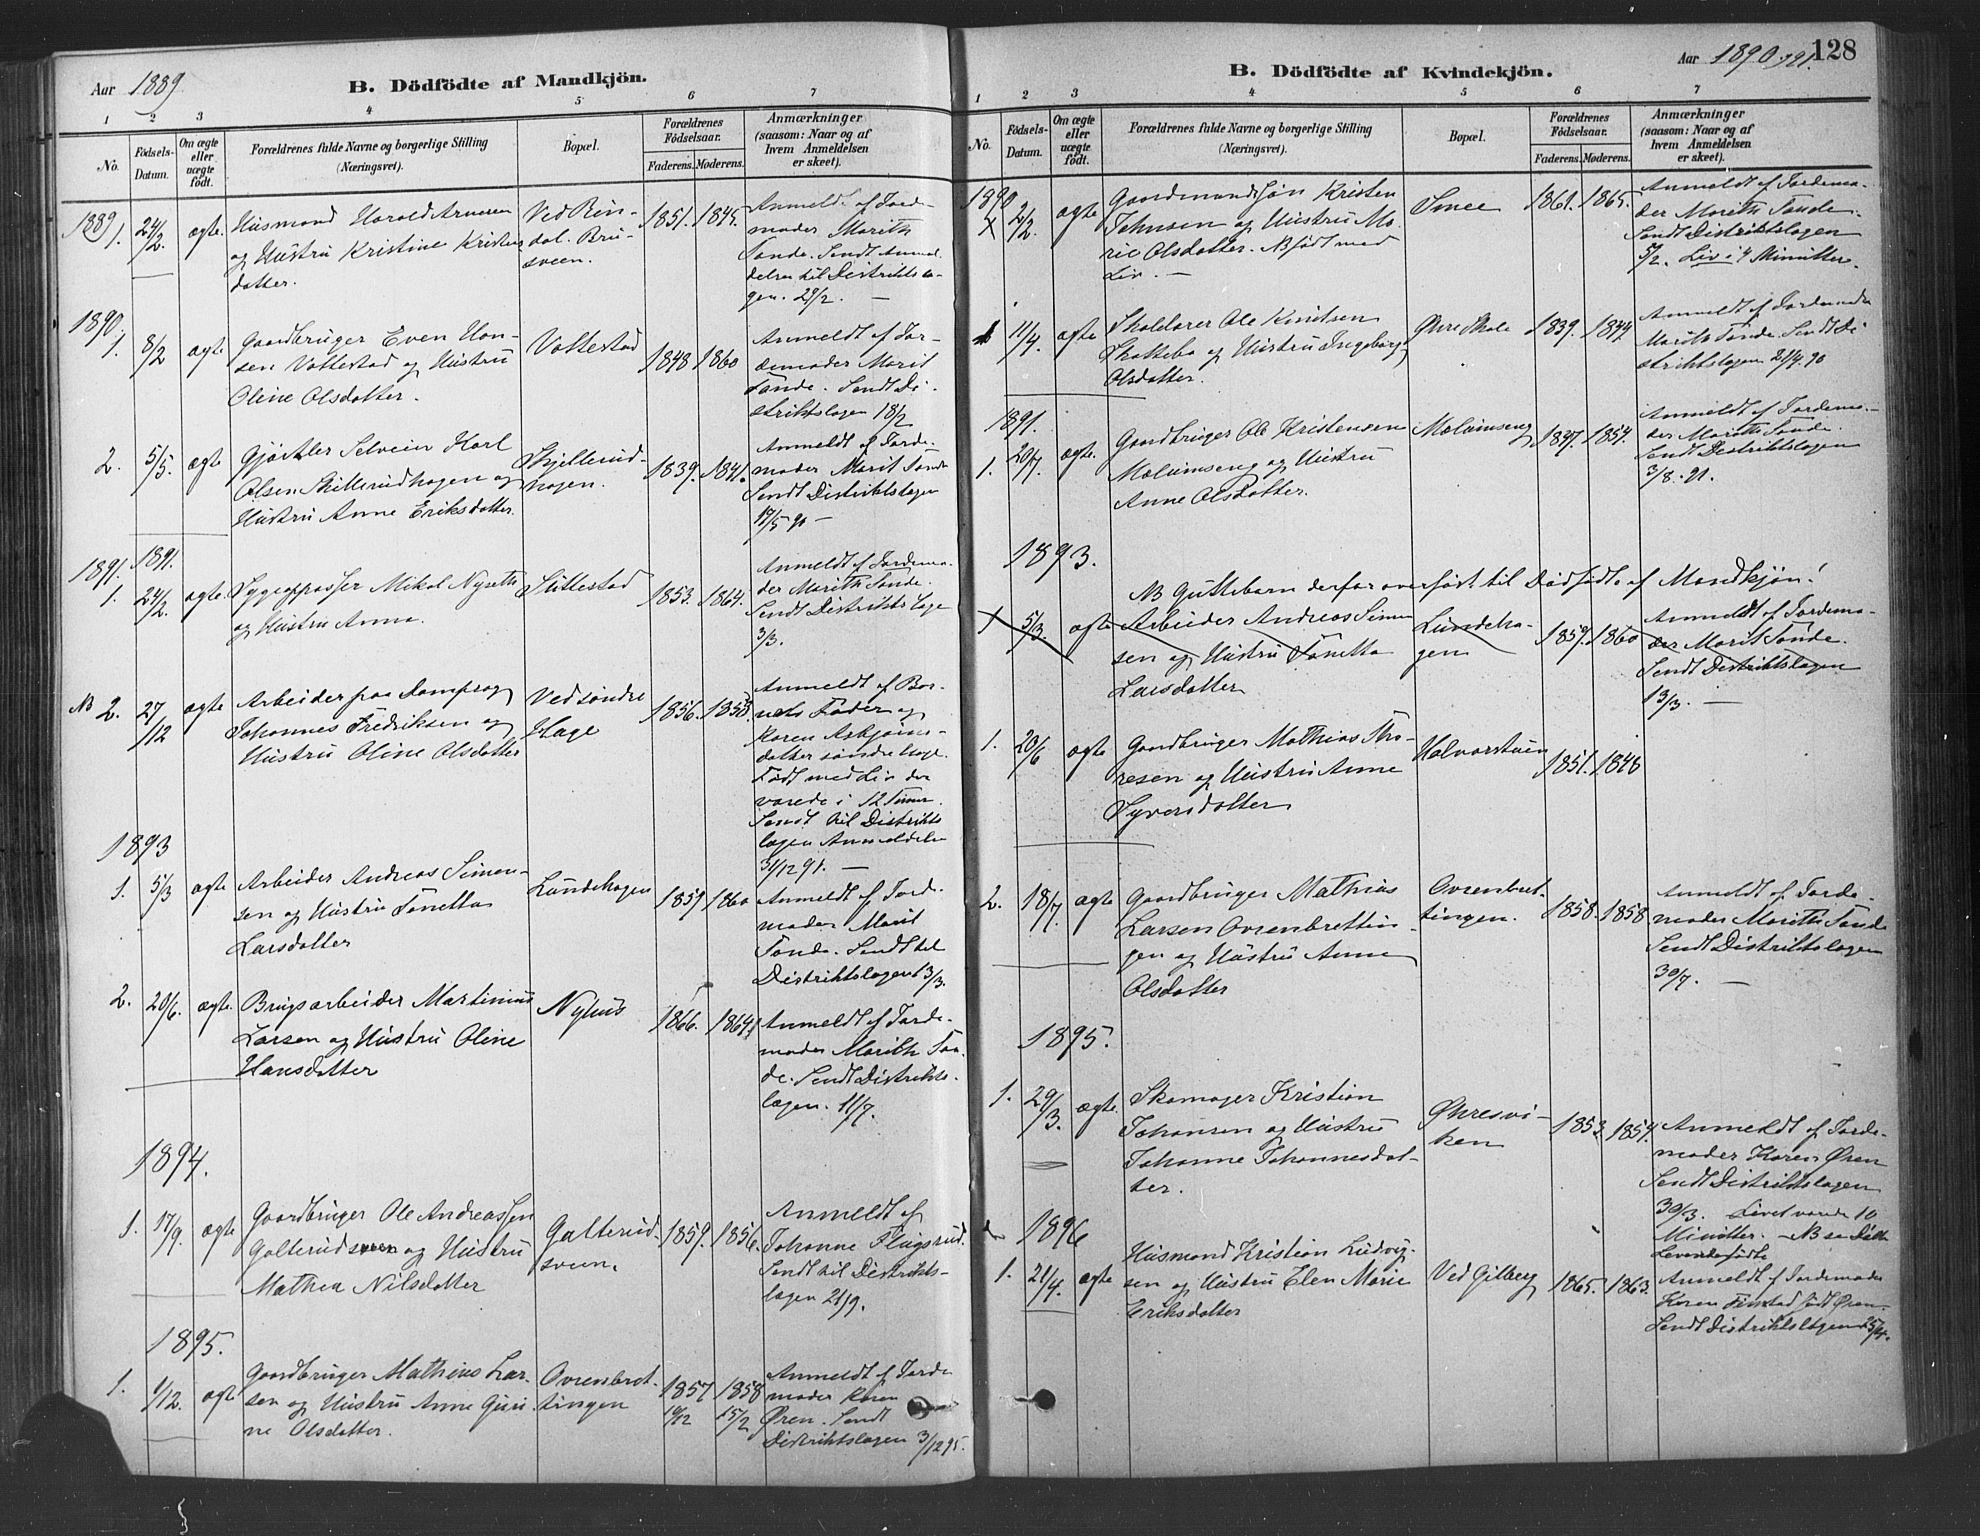 SAH, Fåberg prestekontor, Ministerialbok nr. 9, 1879-1898, s. 128